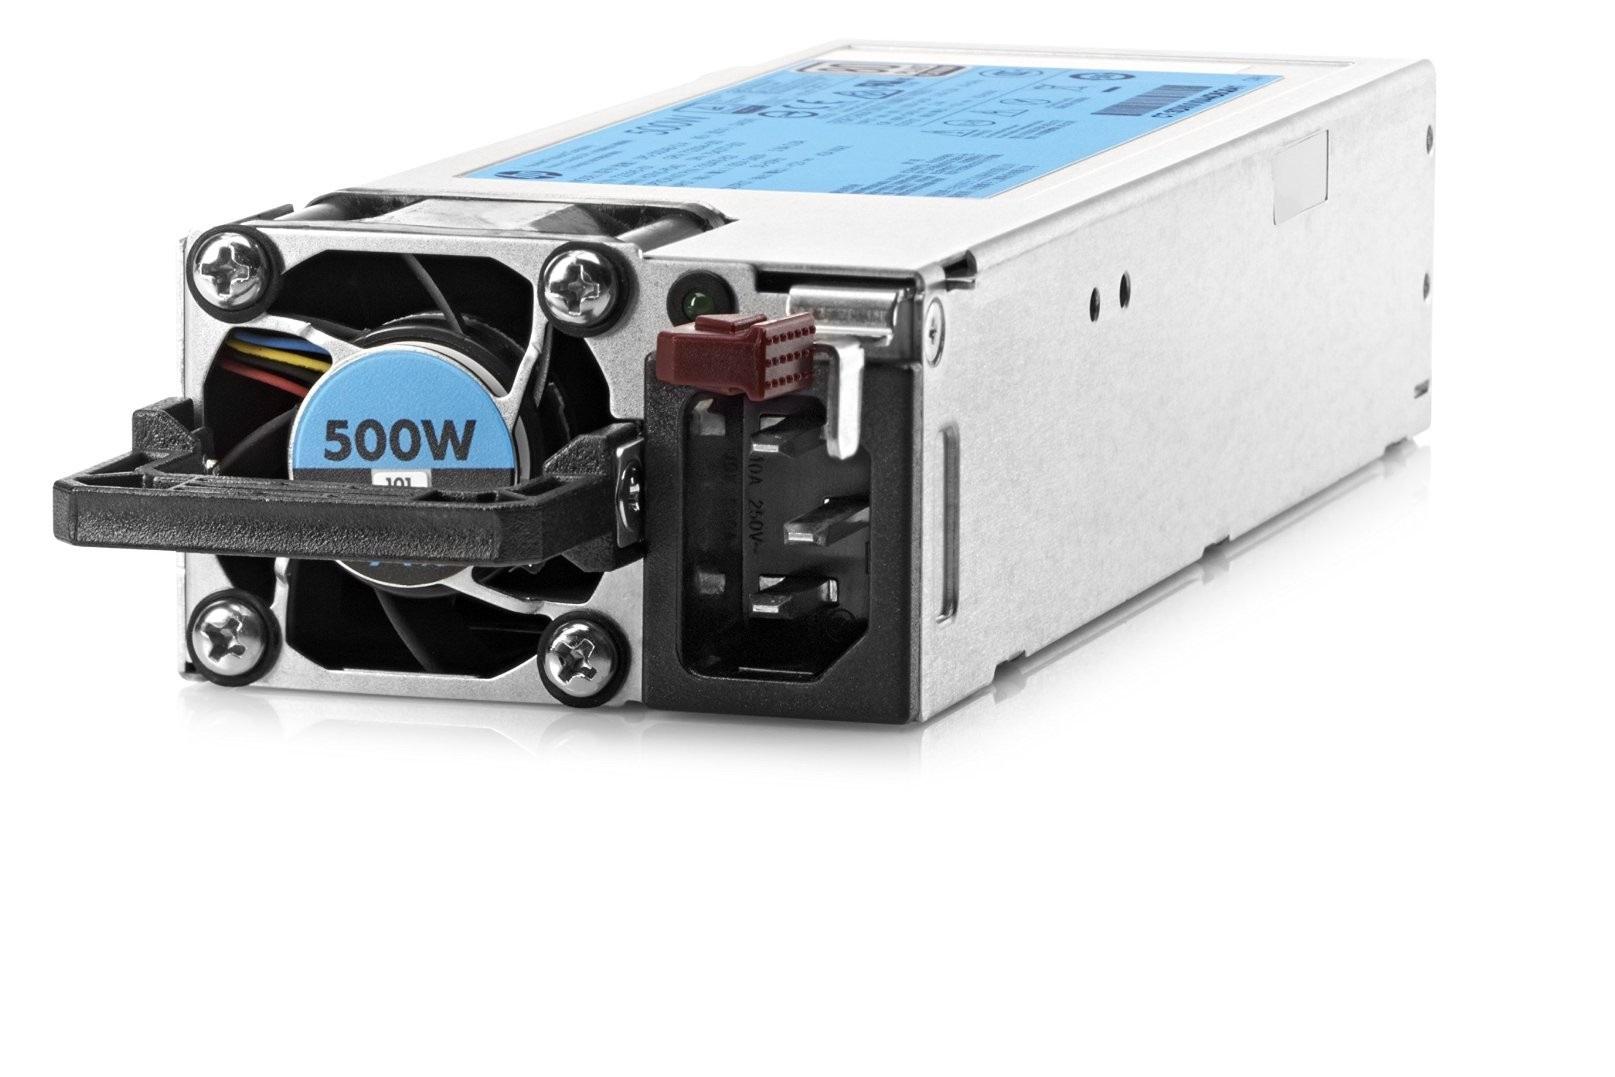 HP HPE Iss 720478-B21 500W Flex Slot Platinum Hot Plug Power Supply 720478-B21HPE